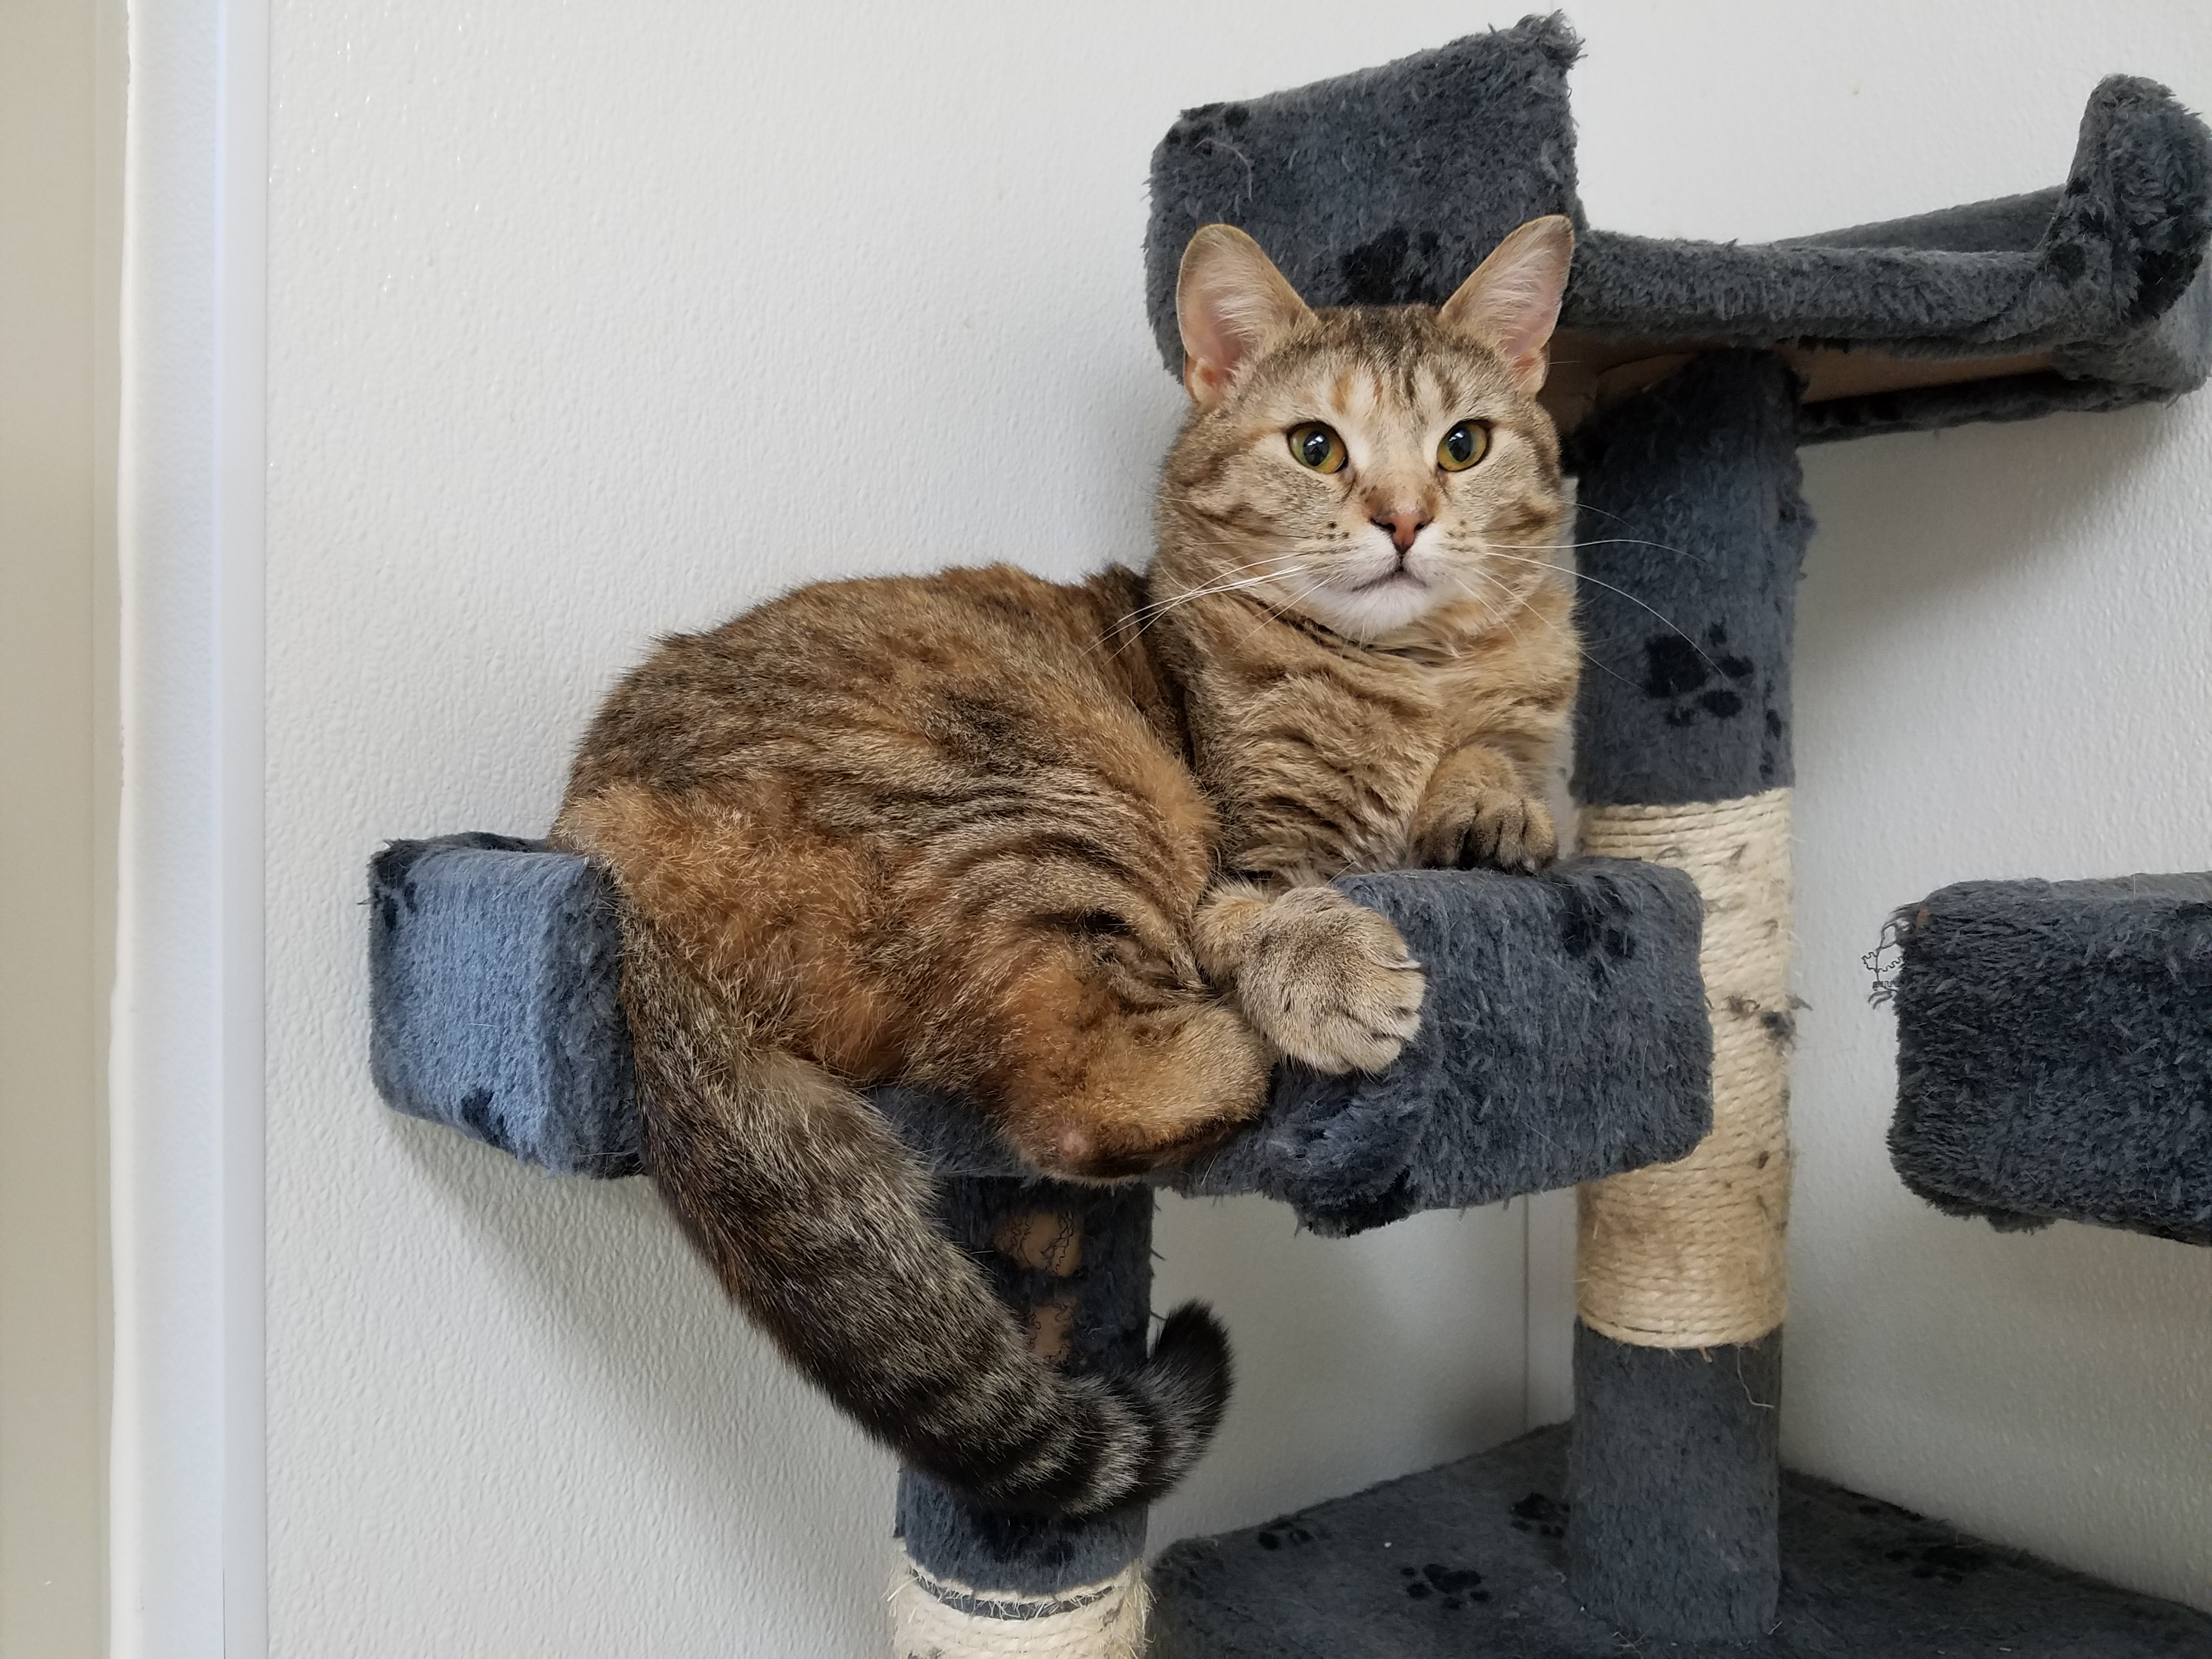 Catrina in a community cat room.